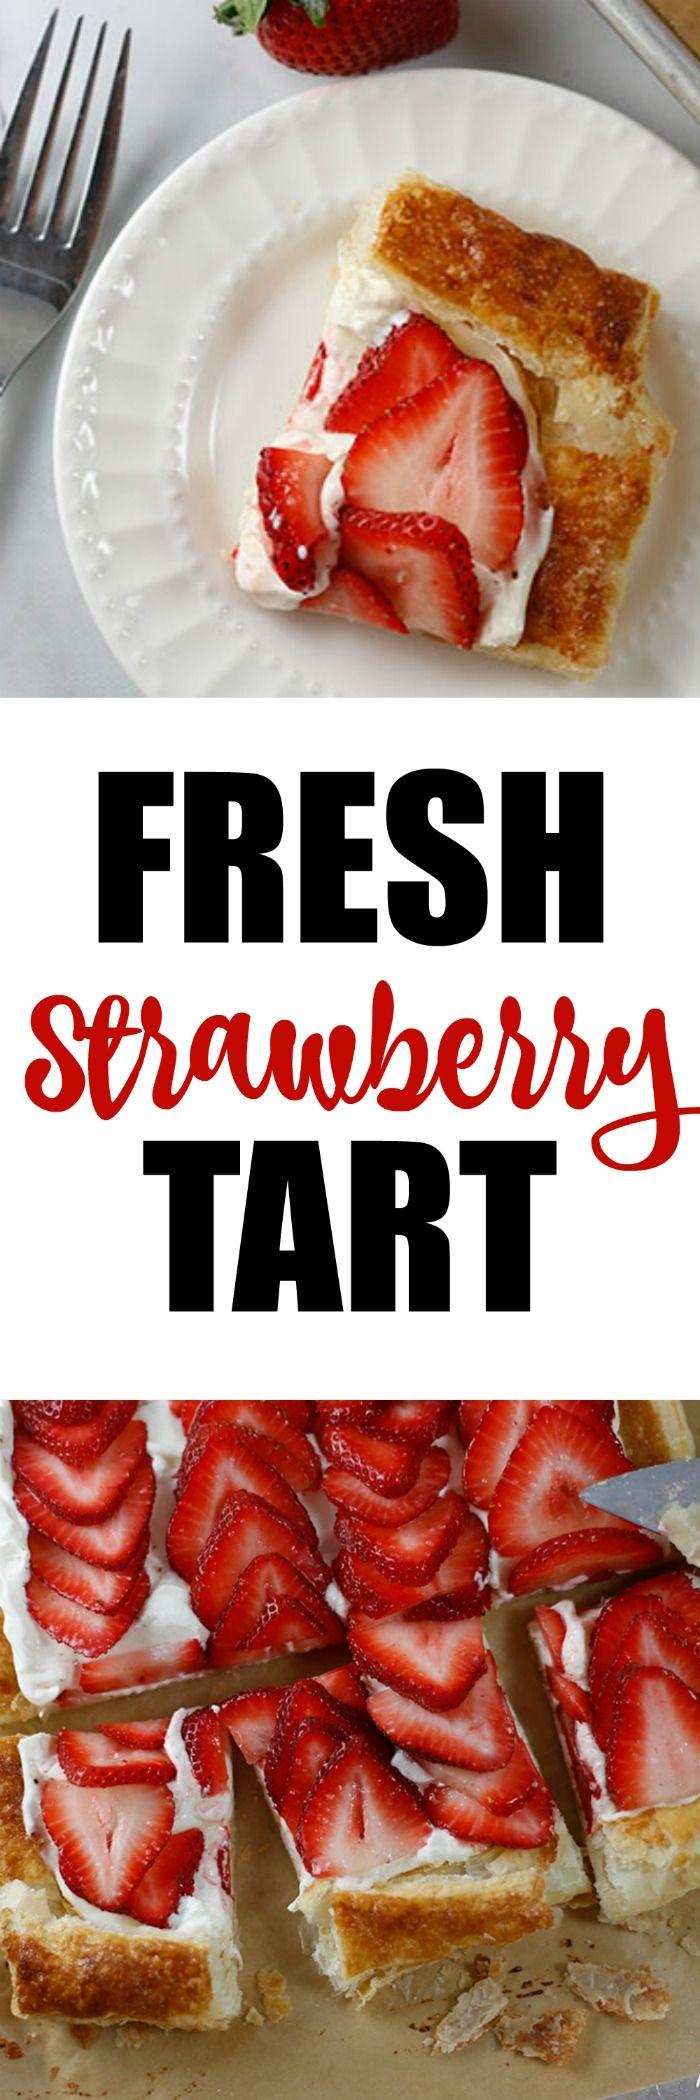 Fresh Strawberry Tart by RoseBakes.com with @Splenda #SplendaSweeties #SweetSwaps #strawberry #tart #dessert #recipe